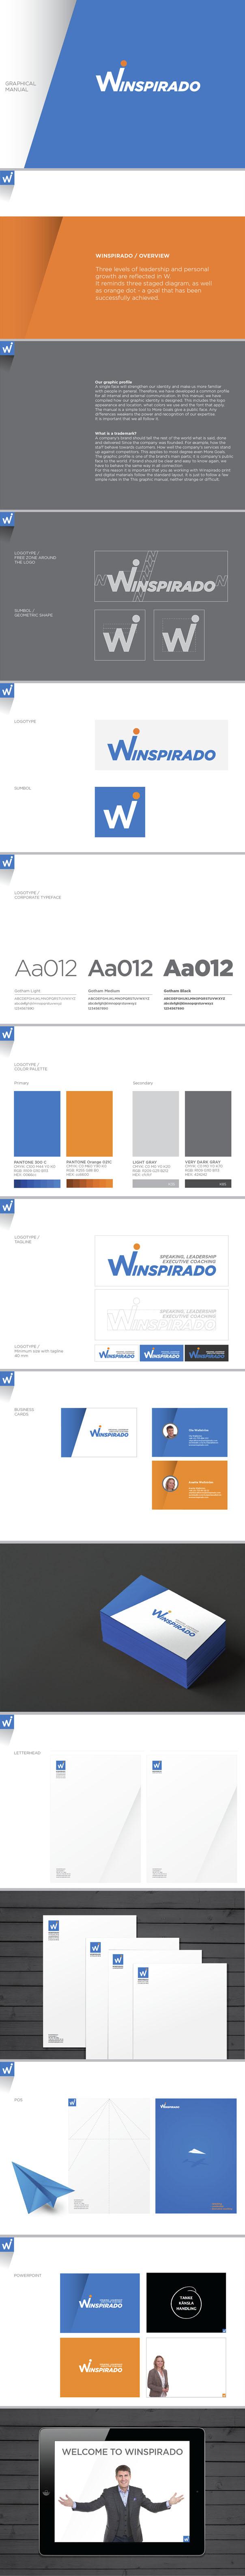 Winspirado_brand_book_iskra_news